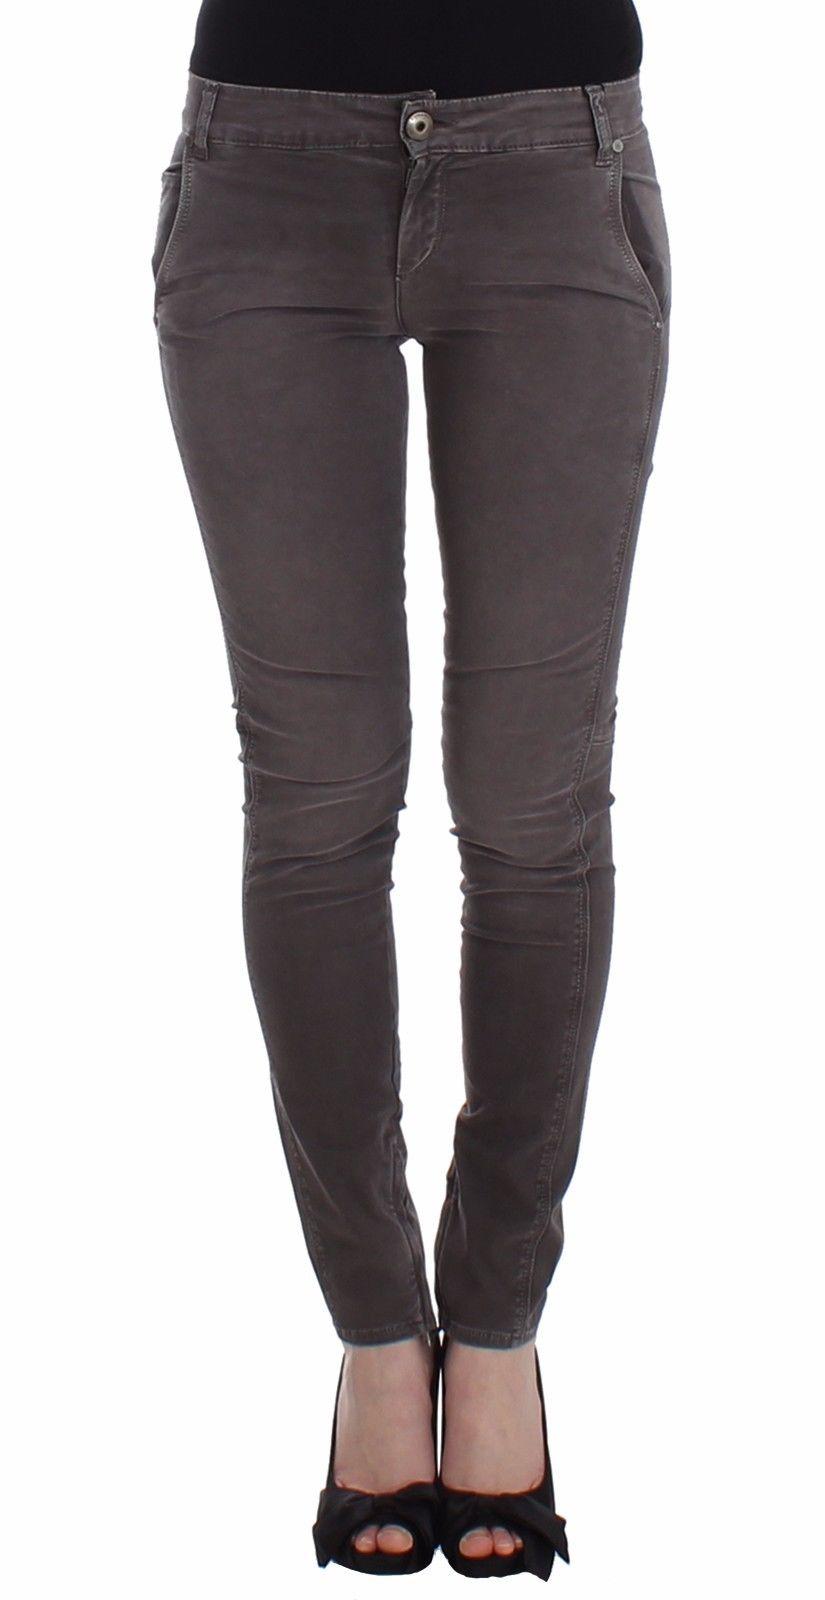 Ermanno Scervino Women's Slim Jeans Grey SIG12460 - W26